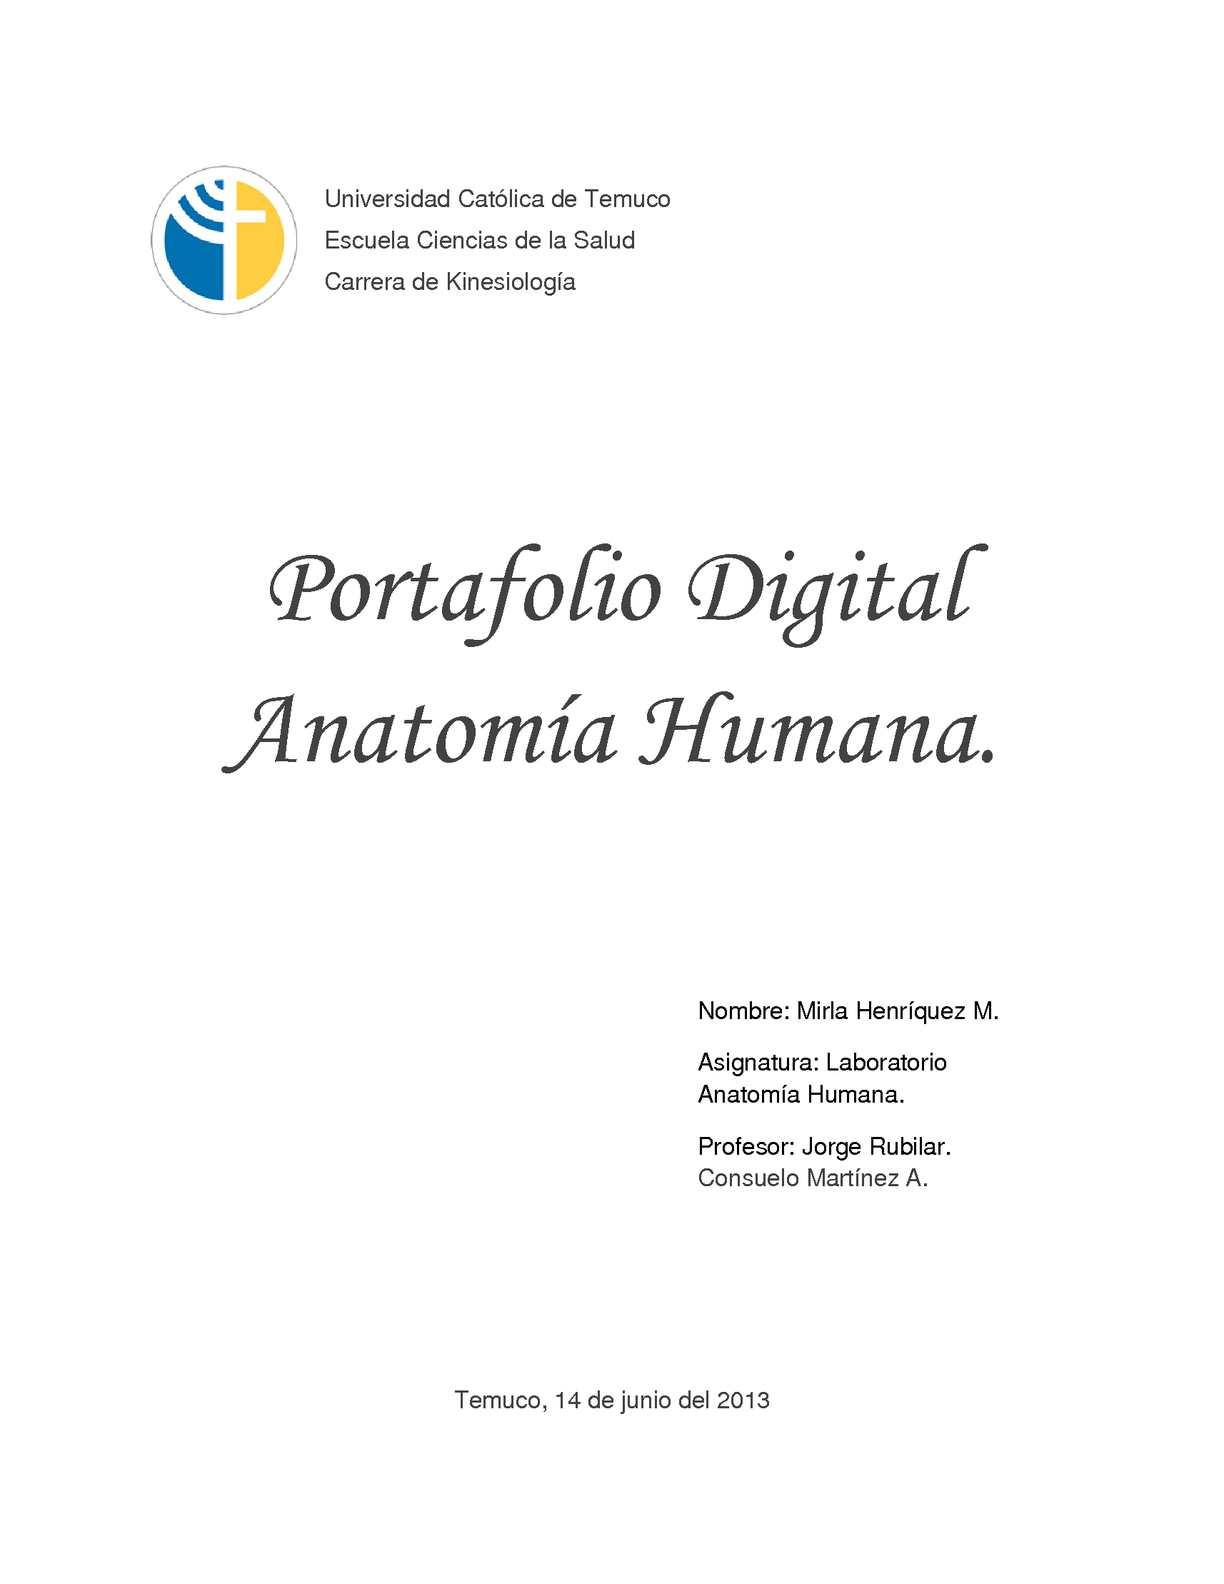 Calaméo - Portafolio Digital Anatomía Humana - Mirla Henriquez